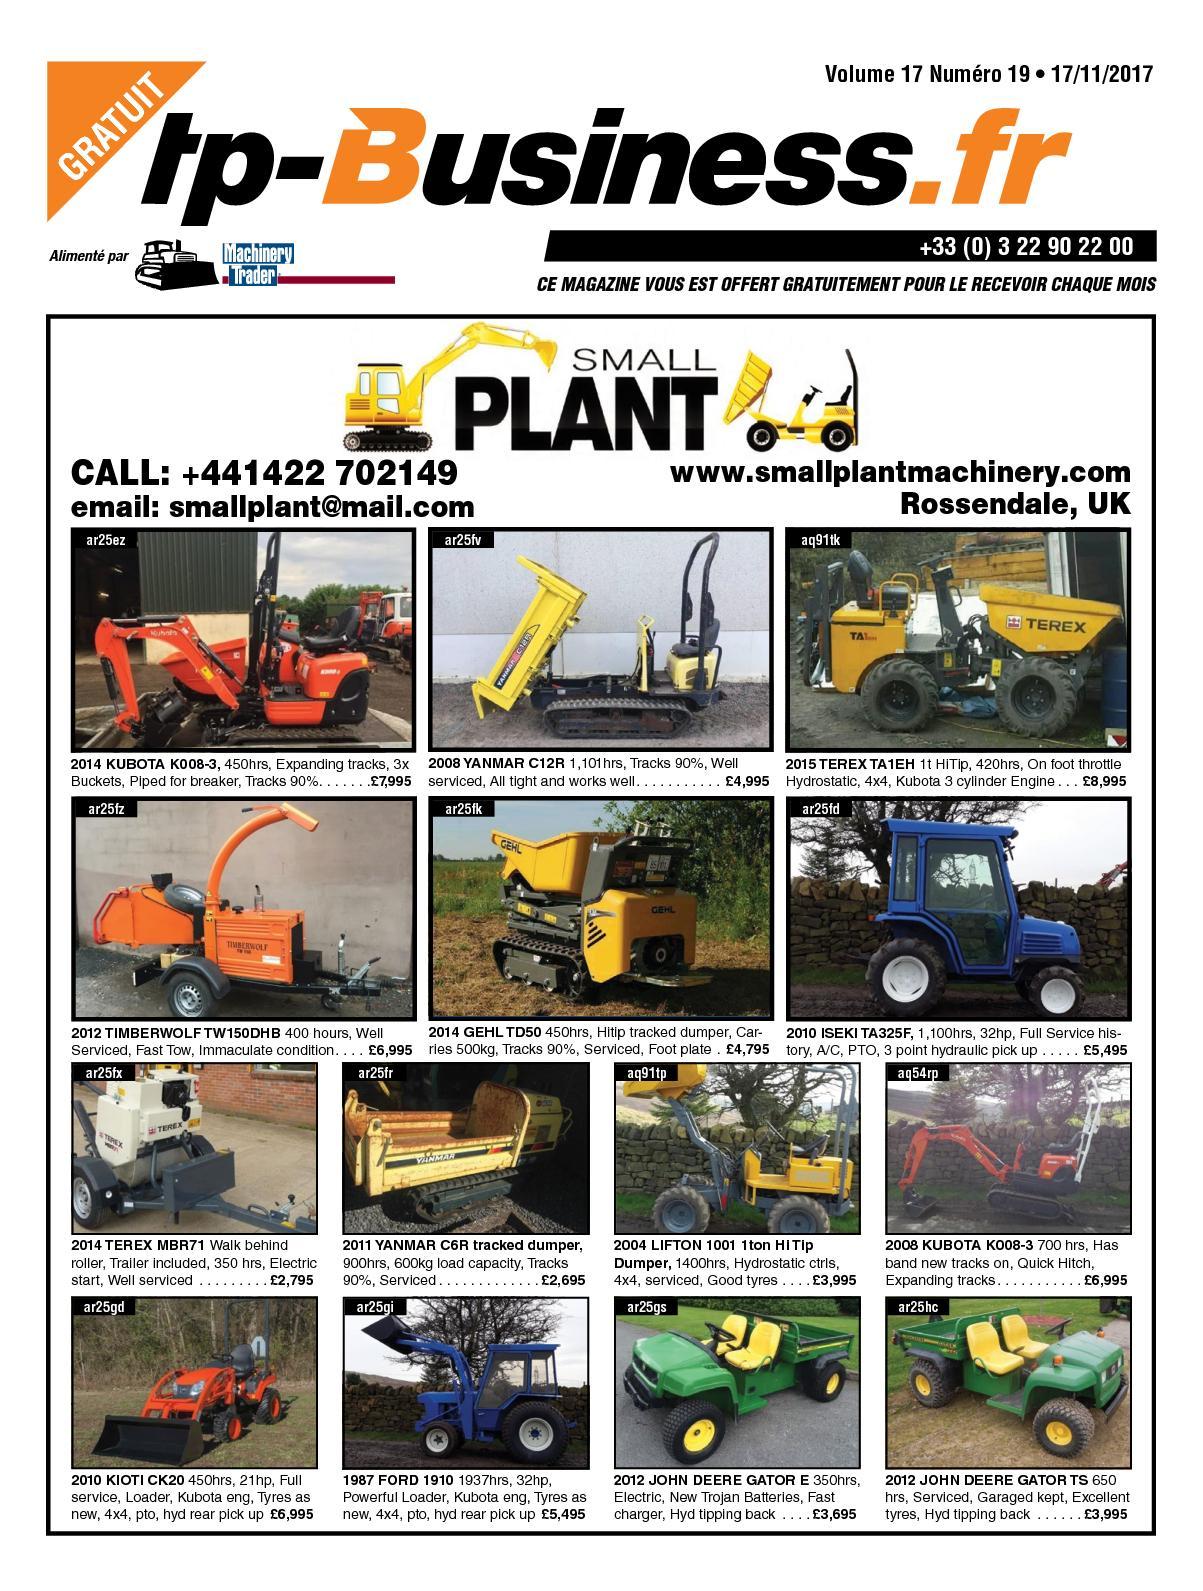 Calamo tp business volume 17 numro 19 17112017 fandeluxe Choice Image